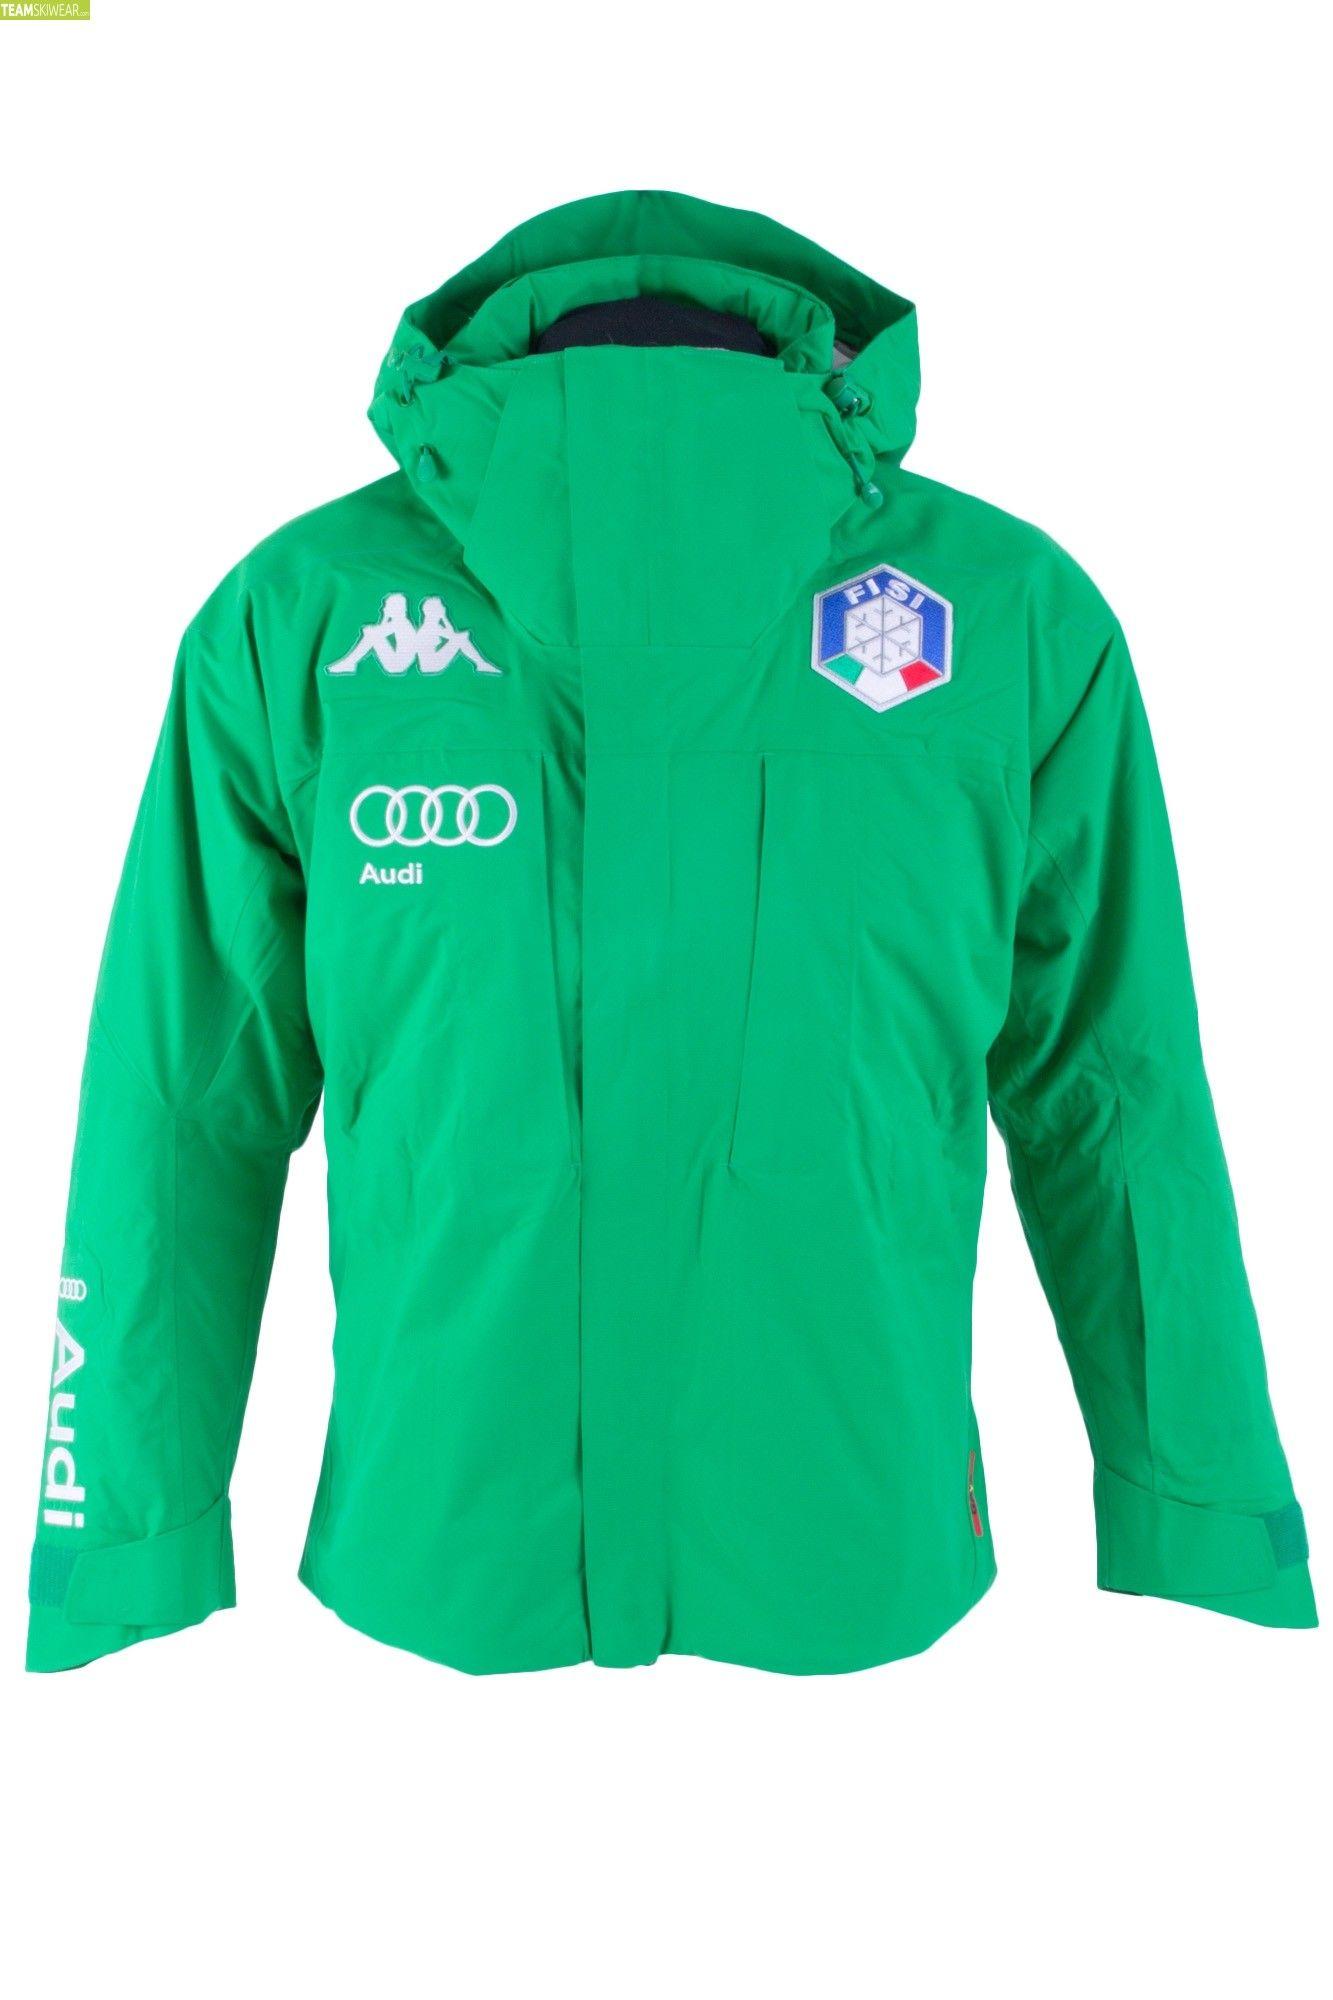 de0f8e5cc1a3 Kappa Men Italian Alpine Team FISI Jacket - Green Grey Silver ...